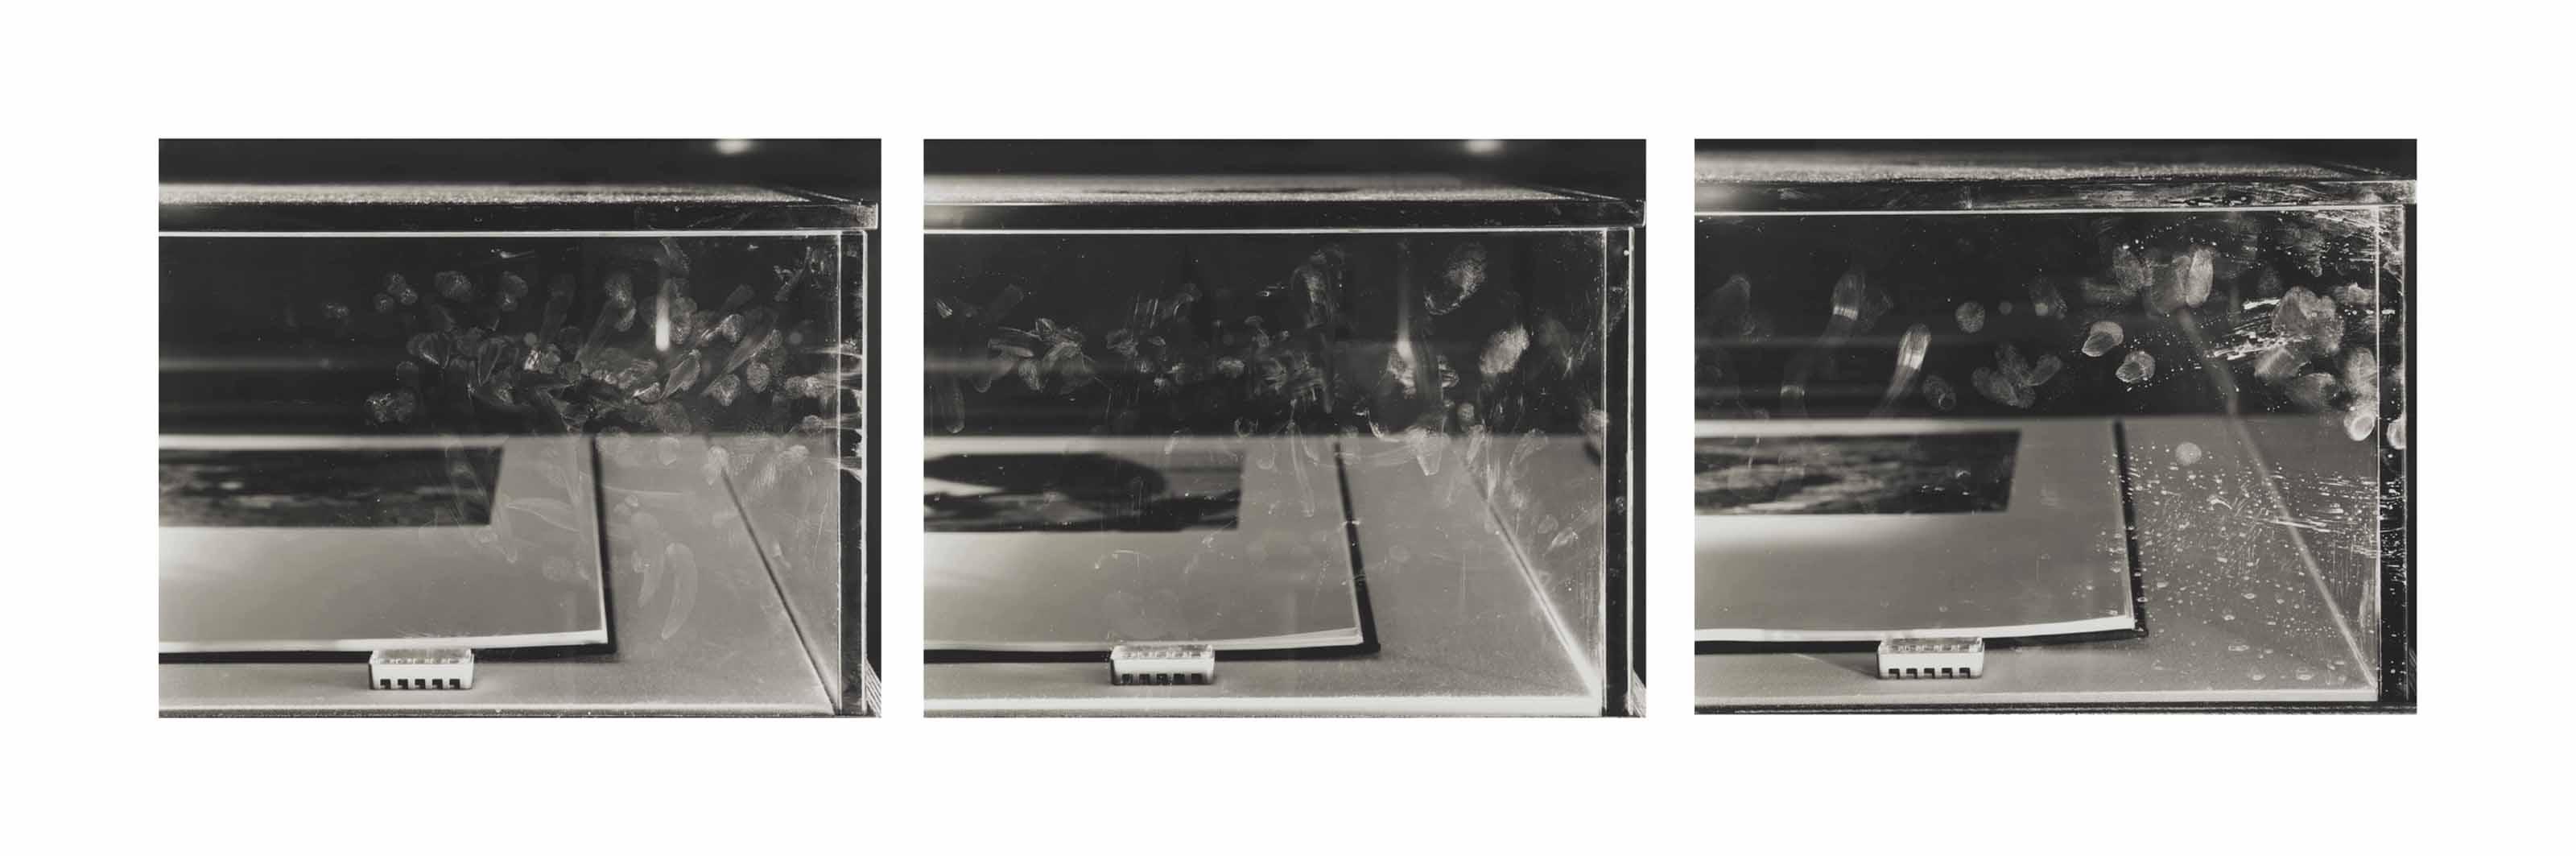 "Figure I, Accretions, January 16, 1992 (Cyprus, 1990 [detail]) ""Carnegie International 1991,"" The Carnegie Museum of Art, Pittsburgh, Pa., October 19, 1991-February 16, 1992  Figure II. Accretions, January 16, 1992 (Guinea, 1990 [detail]) ""Carnegie International 1991,"" The Carnegie Museum of Art, Pittsburgh, Pa., October 19, 1991-February 16, 1992  Figure III. Accretions, January 16, 1992 (Iran, 1990 [detail]) ""Carnegie International 1991,"" The Carnegie Museum of Art, Pittsburgh, Pa., October 19, 1991-February 16, 1992"